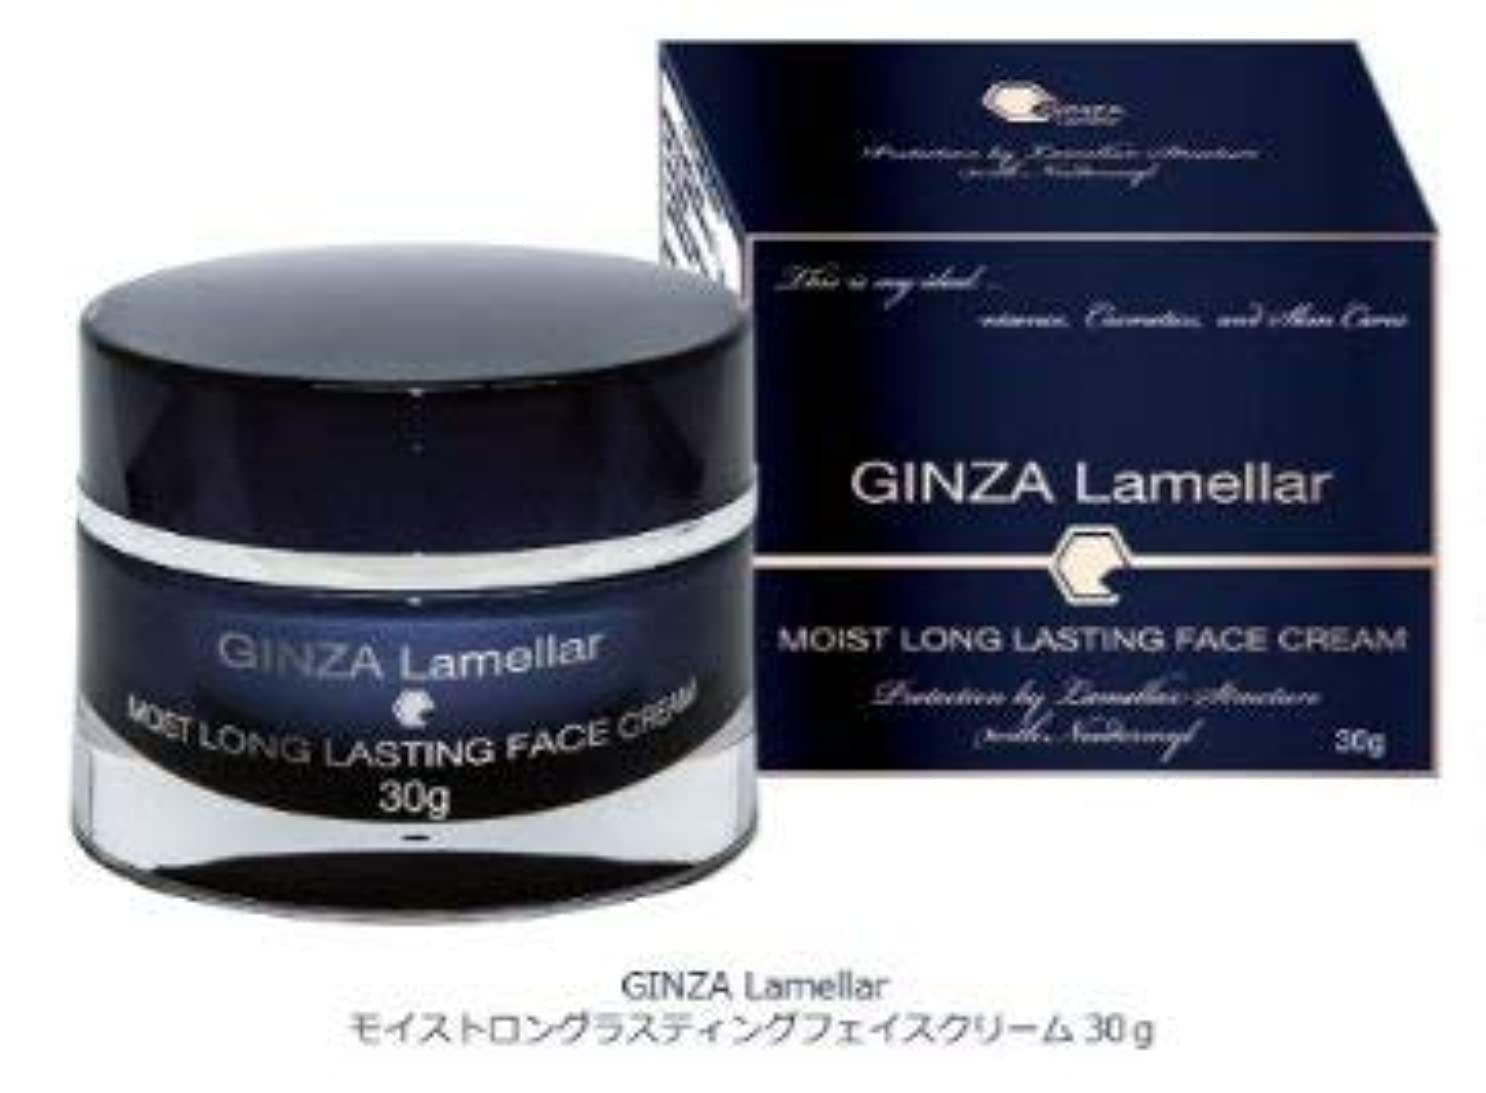 GINZA Lamellar 銀座ラメラ モイストロングラスティング フェイスクリーム (顔用クリーム) 30g